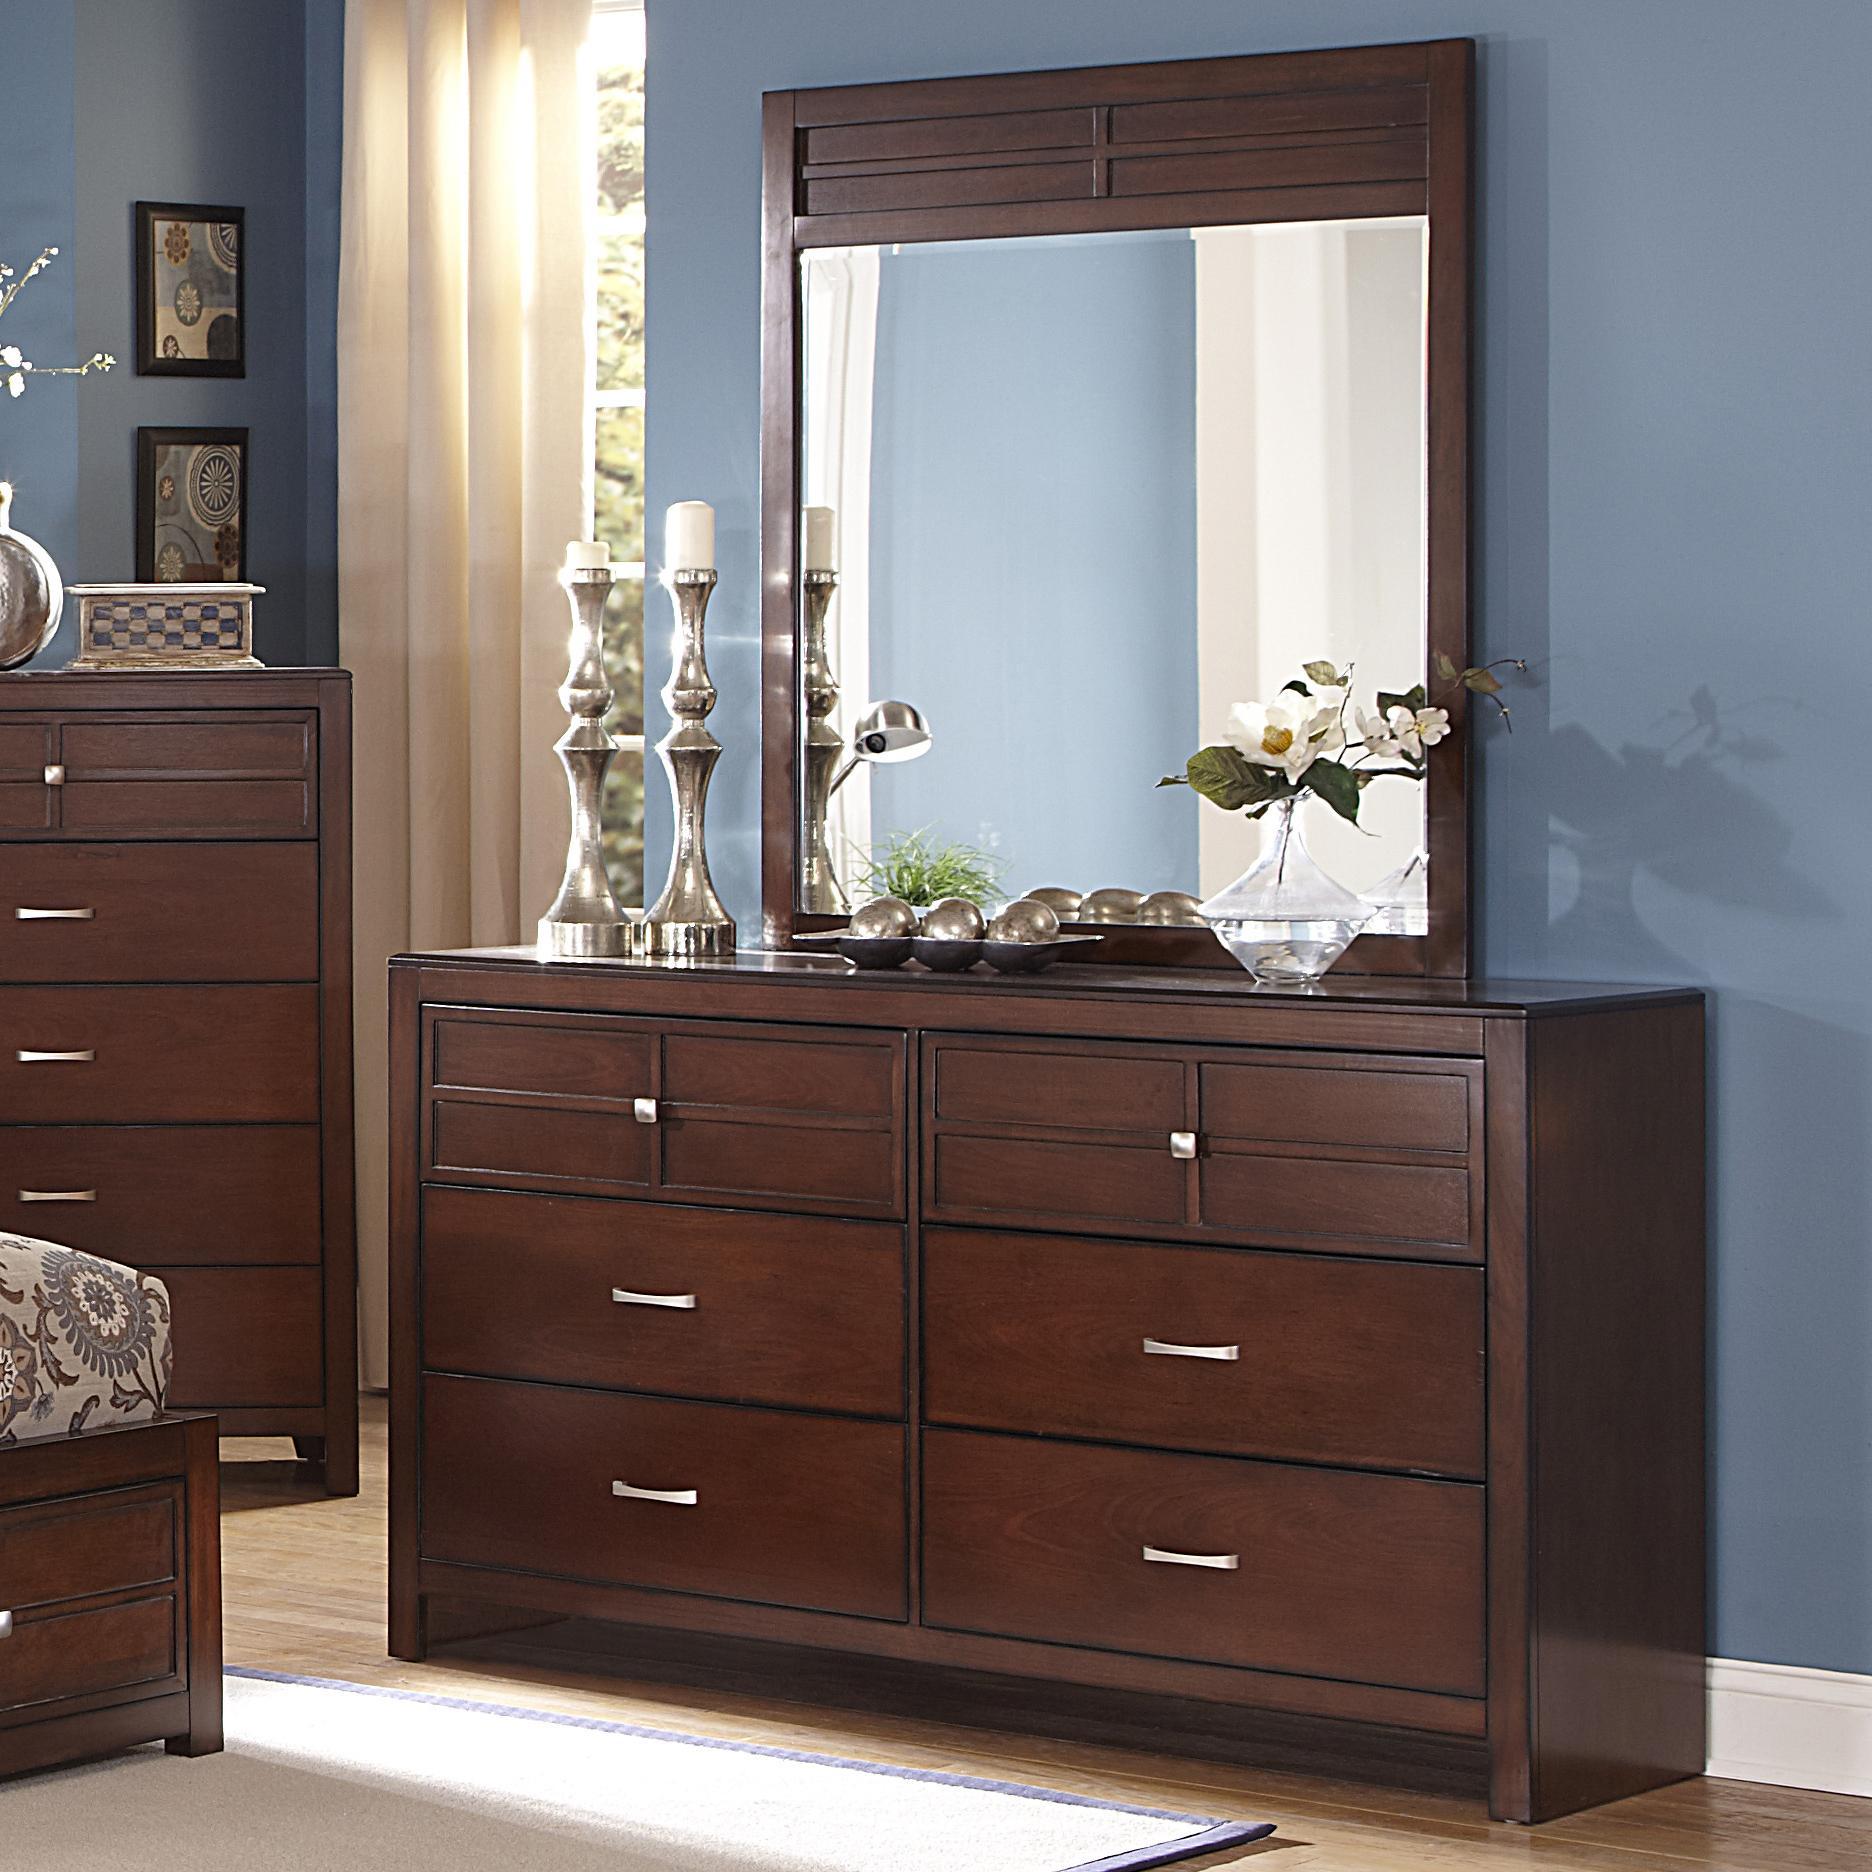 New Classic Kensington 6 Drawer Dresser And Vertical Mirror Set Dunk Bright Furniture